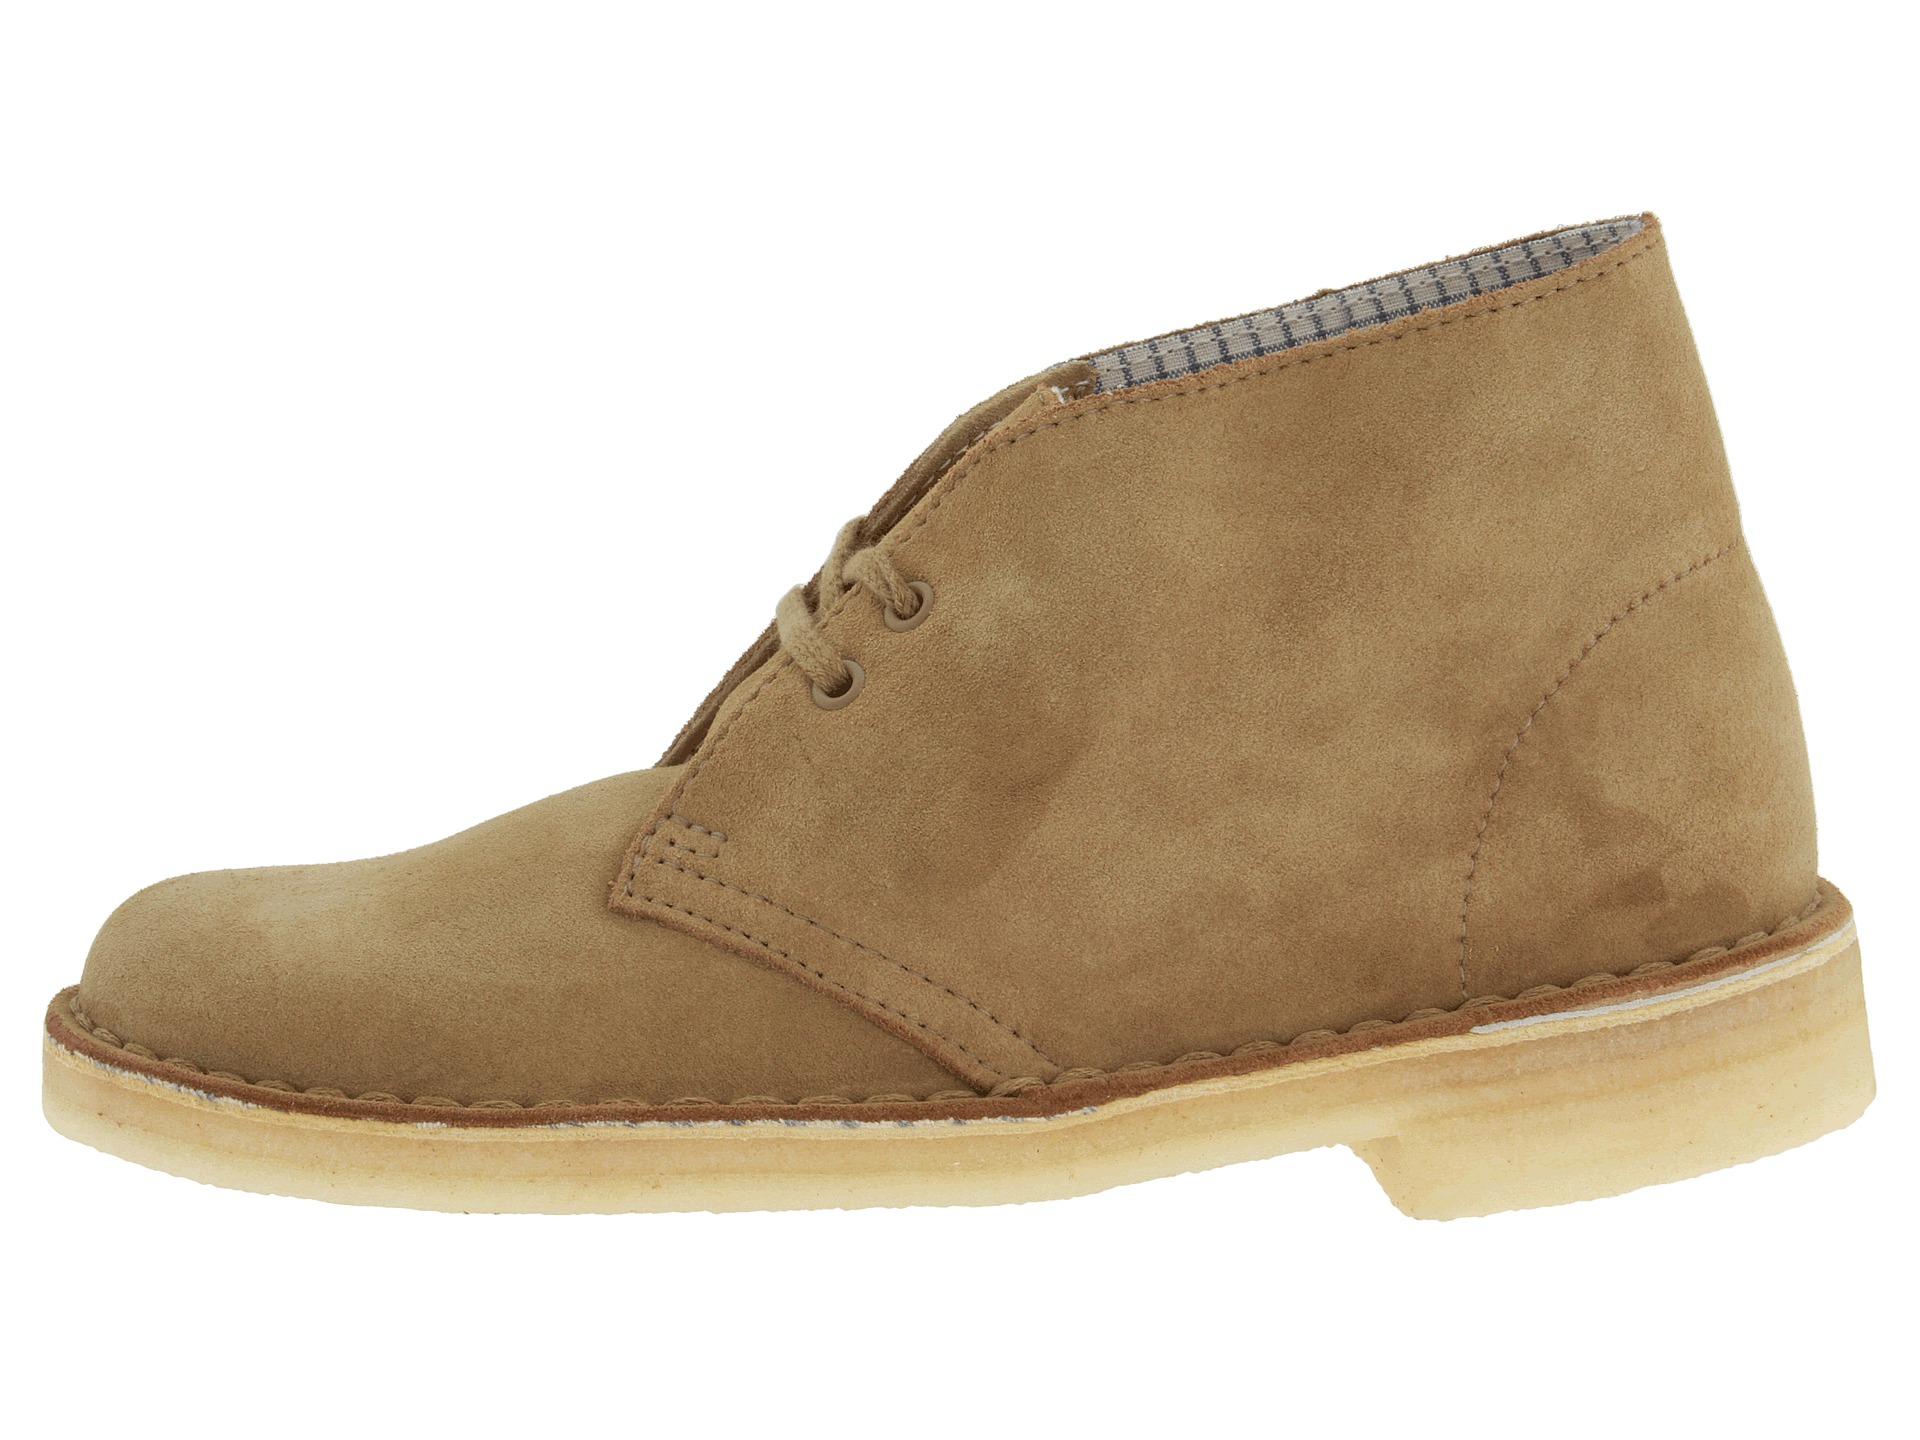 clarks desert boot oakwood suede zappos free